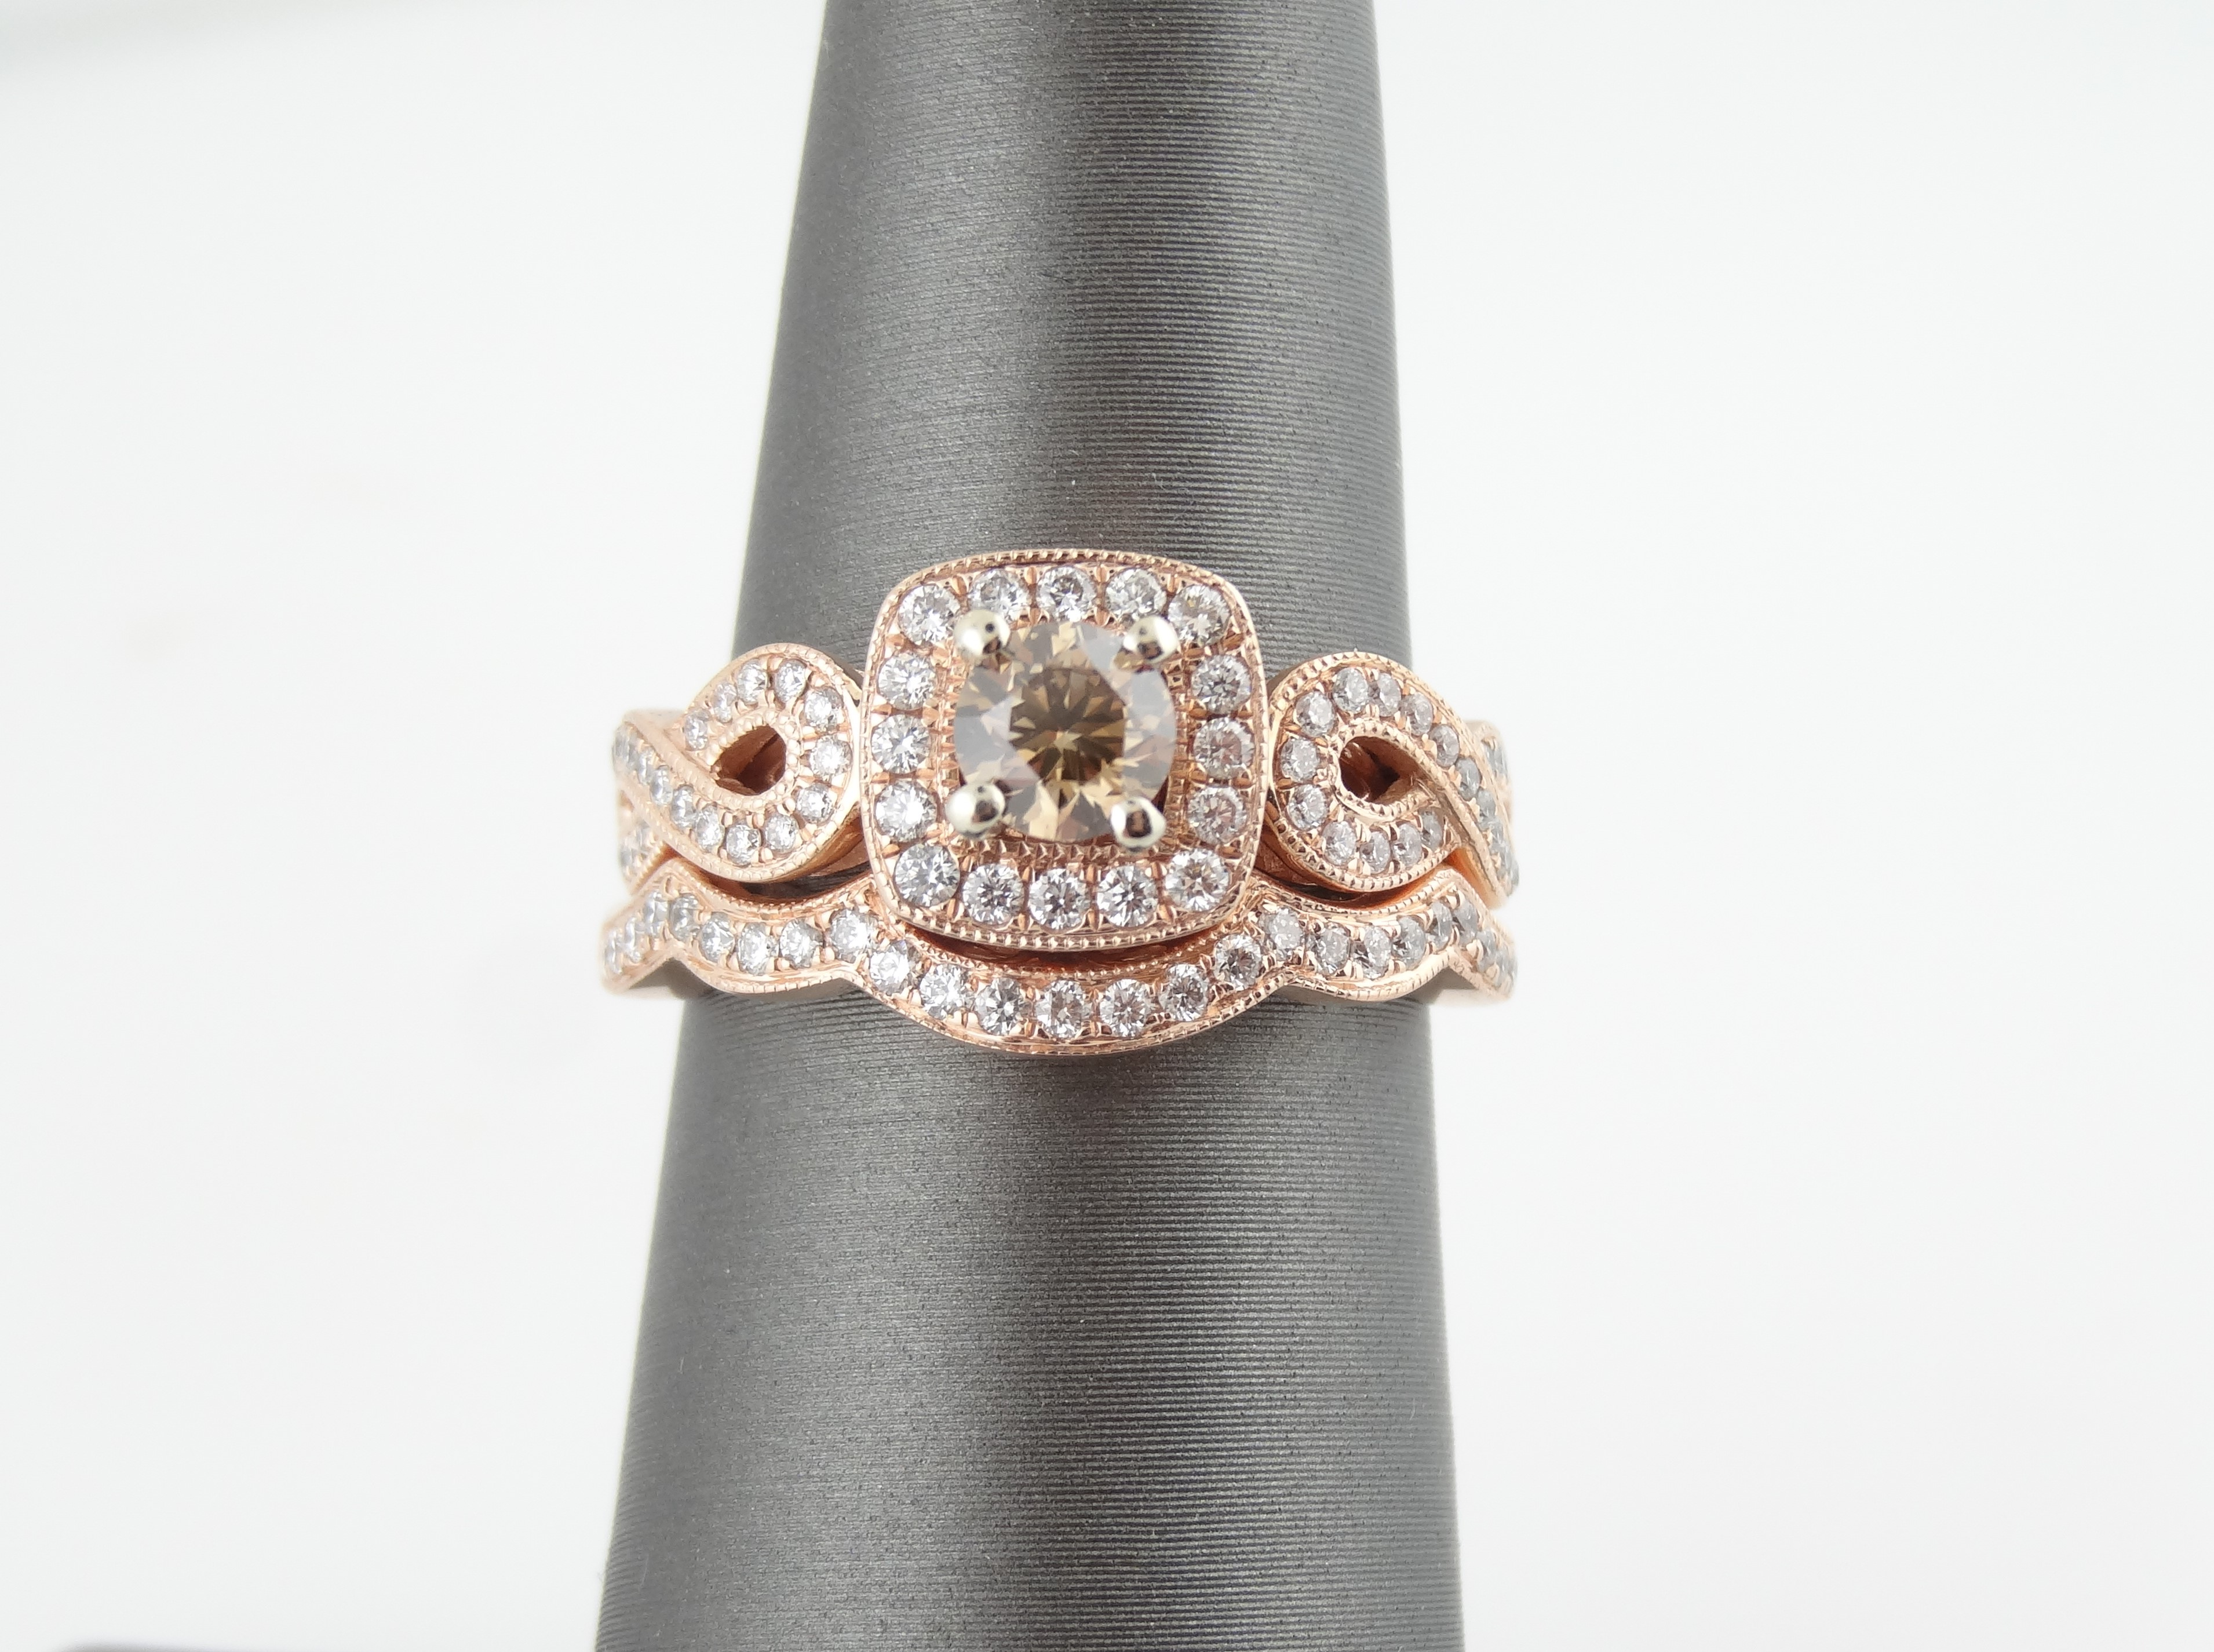 le vian rose gold halo bridal set chocolate and white diamonds